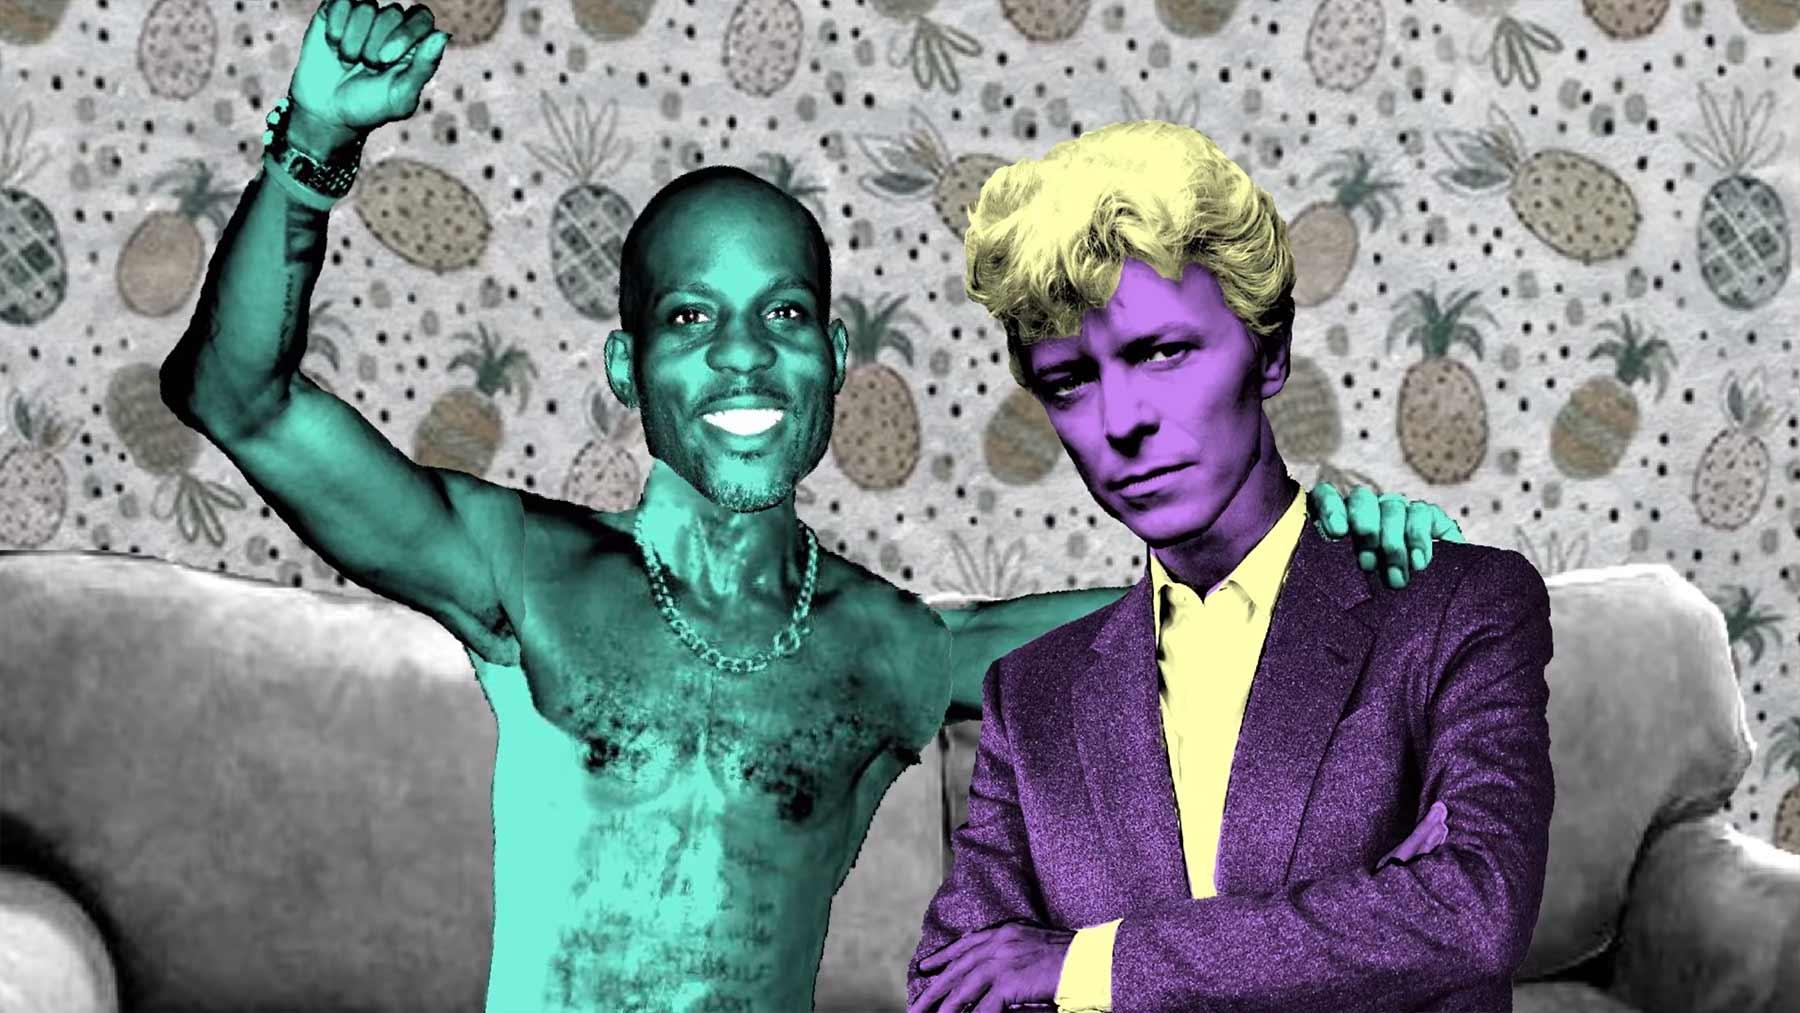 David Bowie trifft DMX david-bowie-trifft-dmx